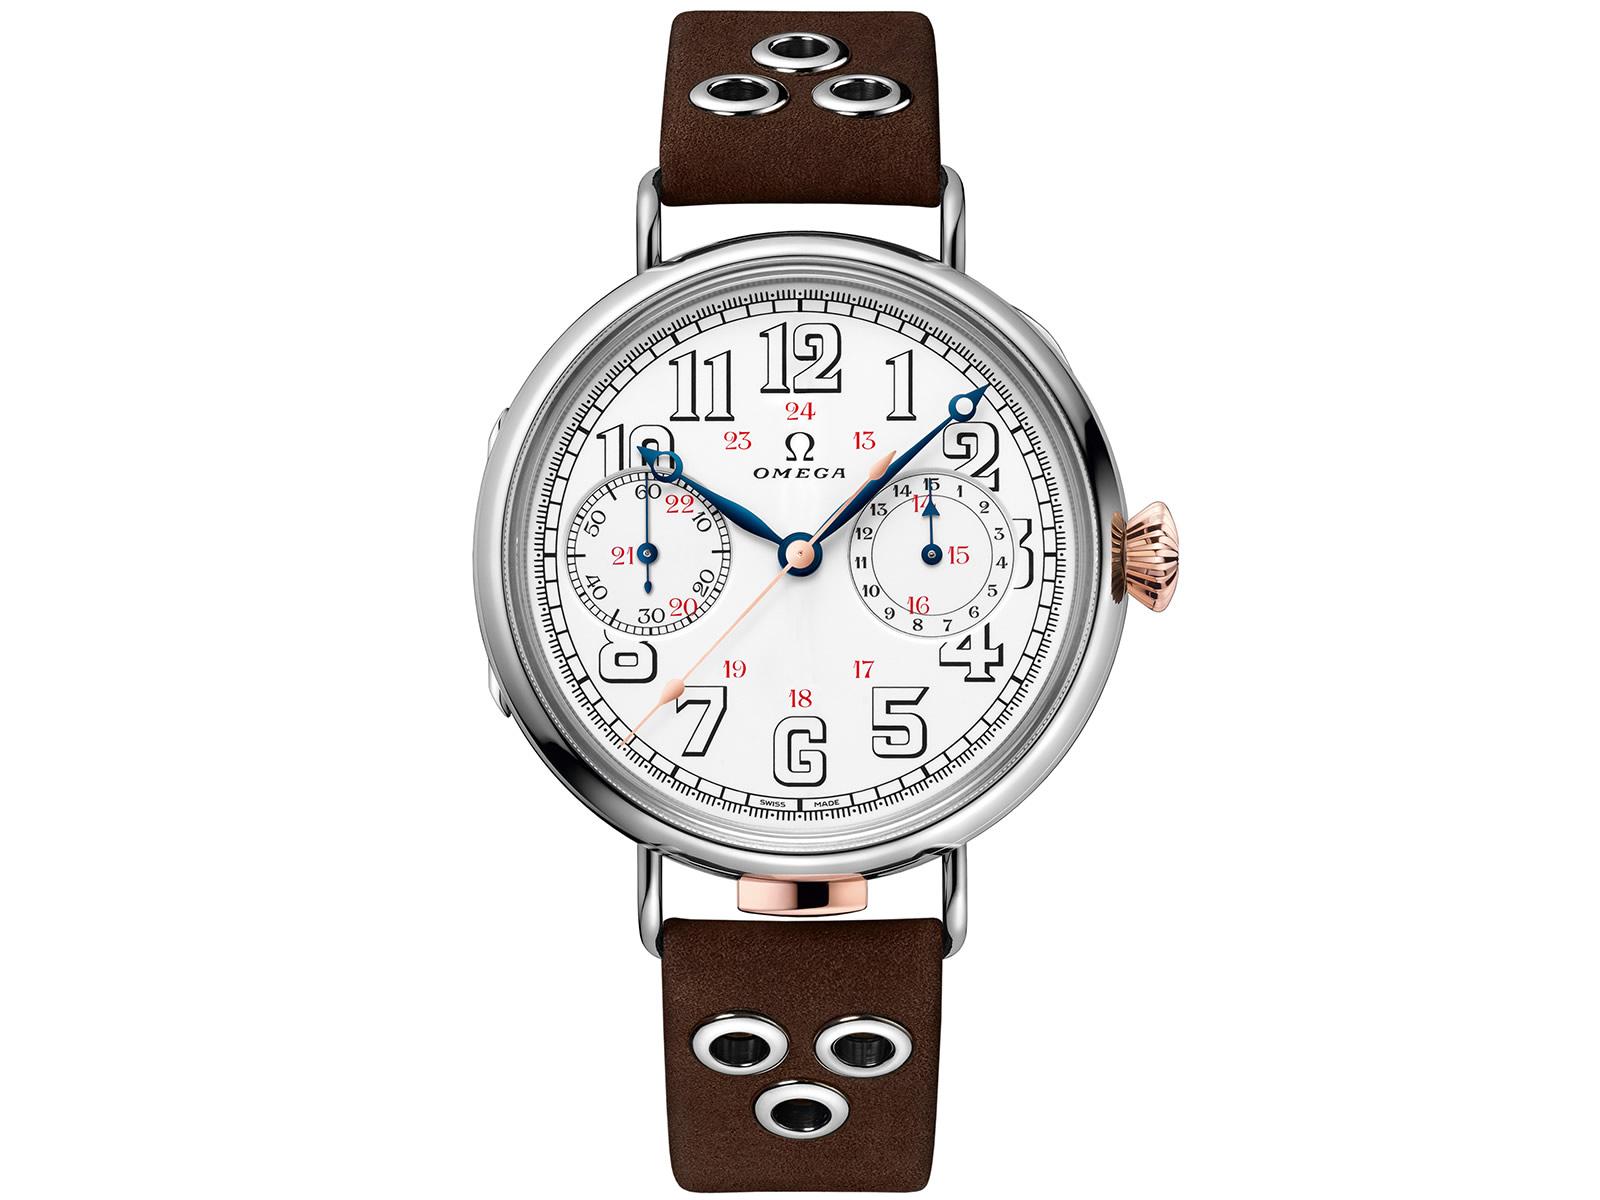 516-52-48-30-04-001-omega-18-chro-wrist-chronograph-limited-edition-6.jpg